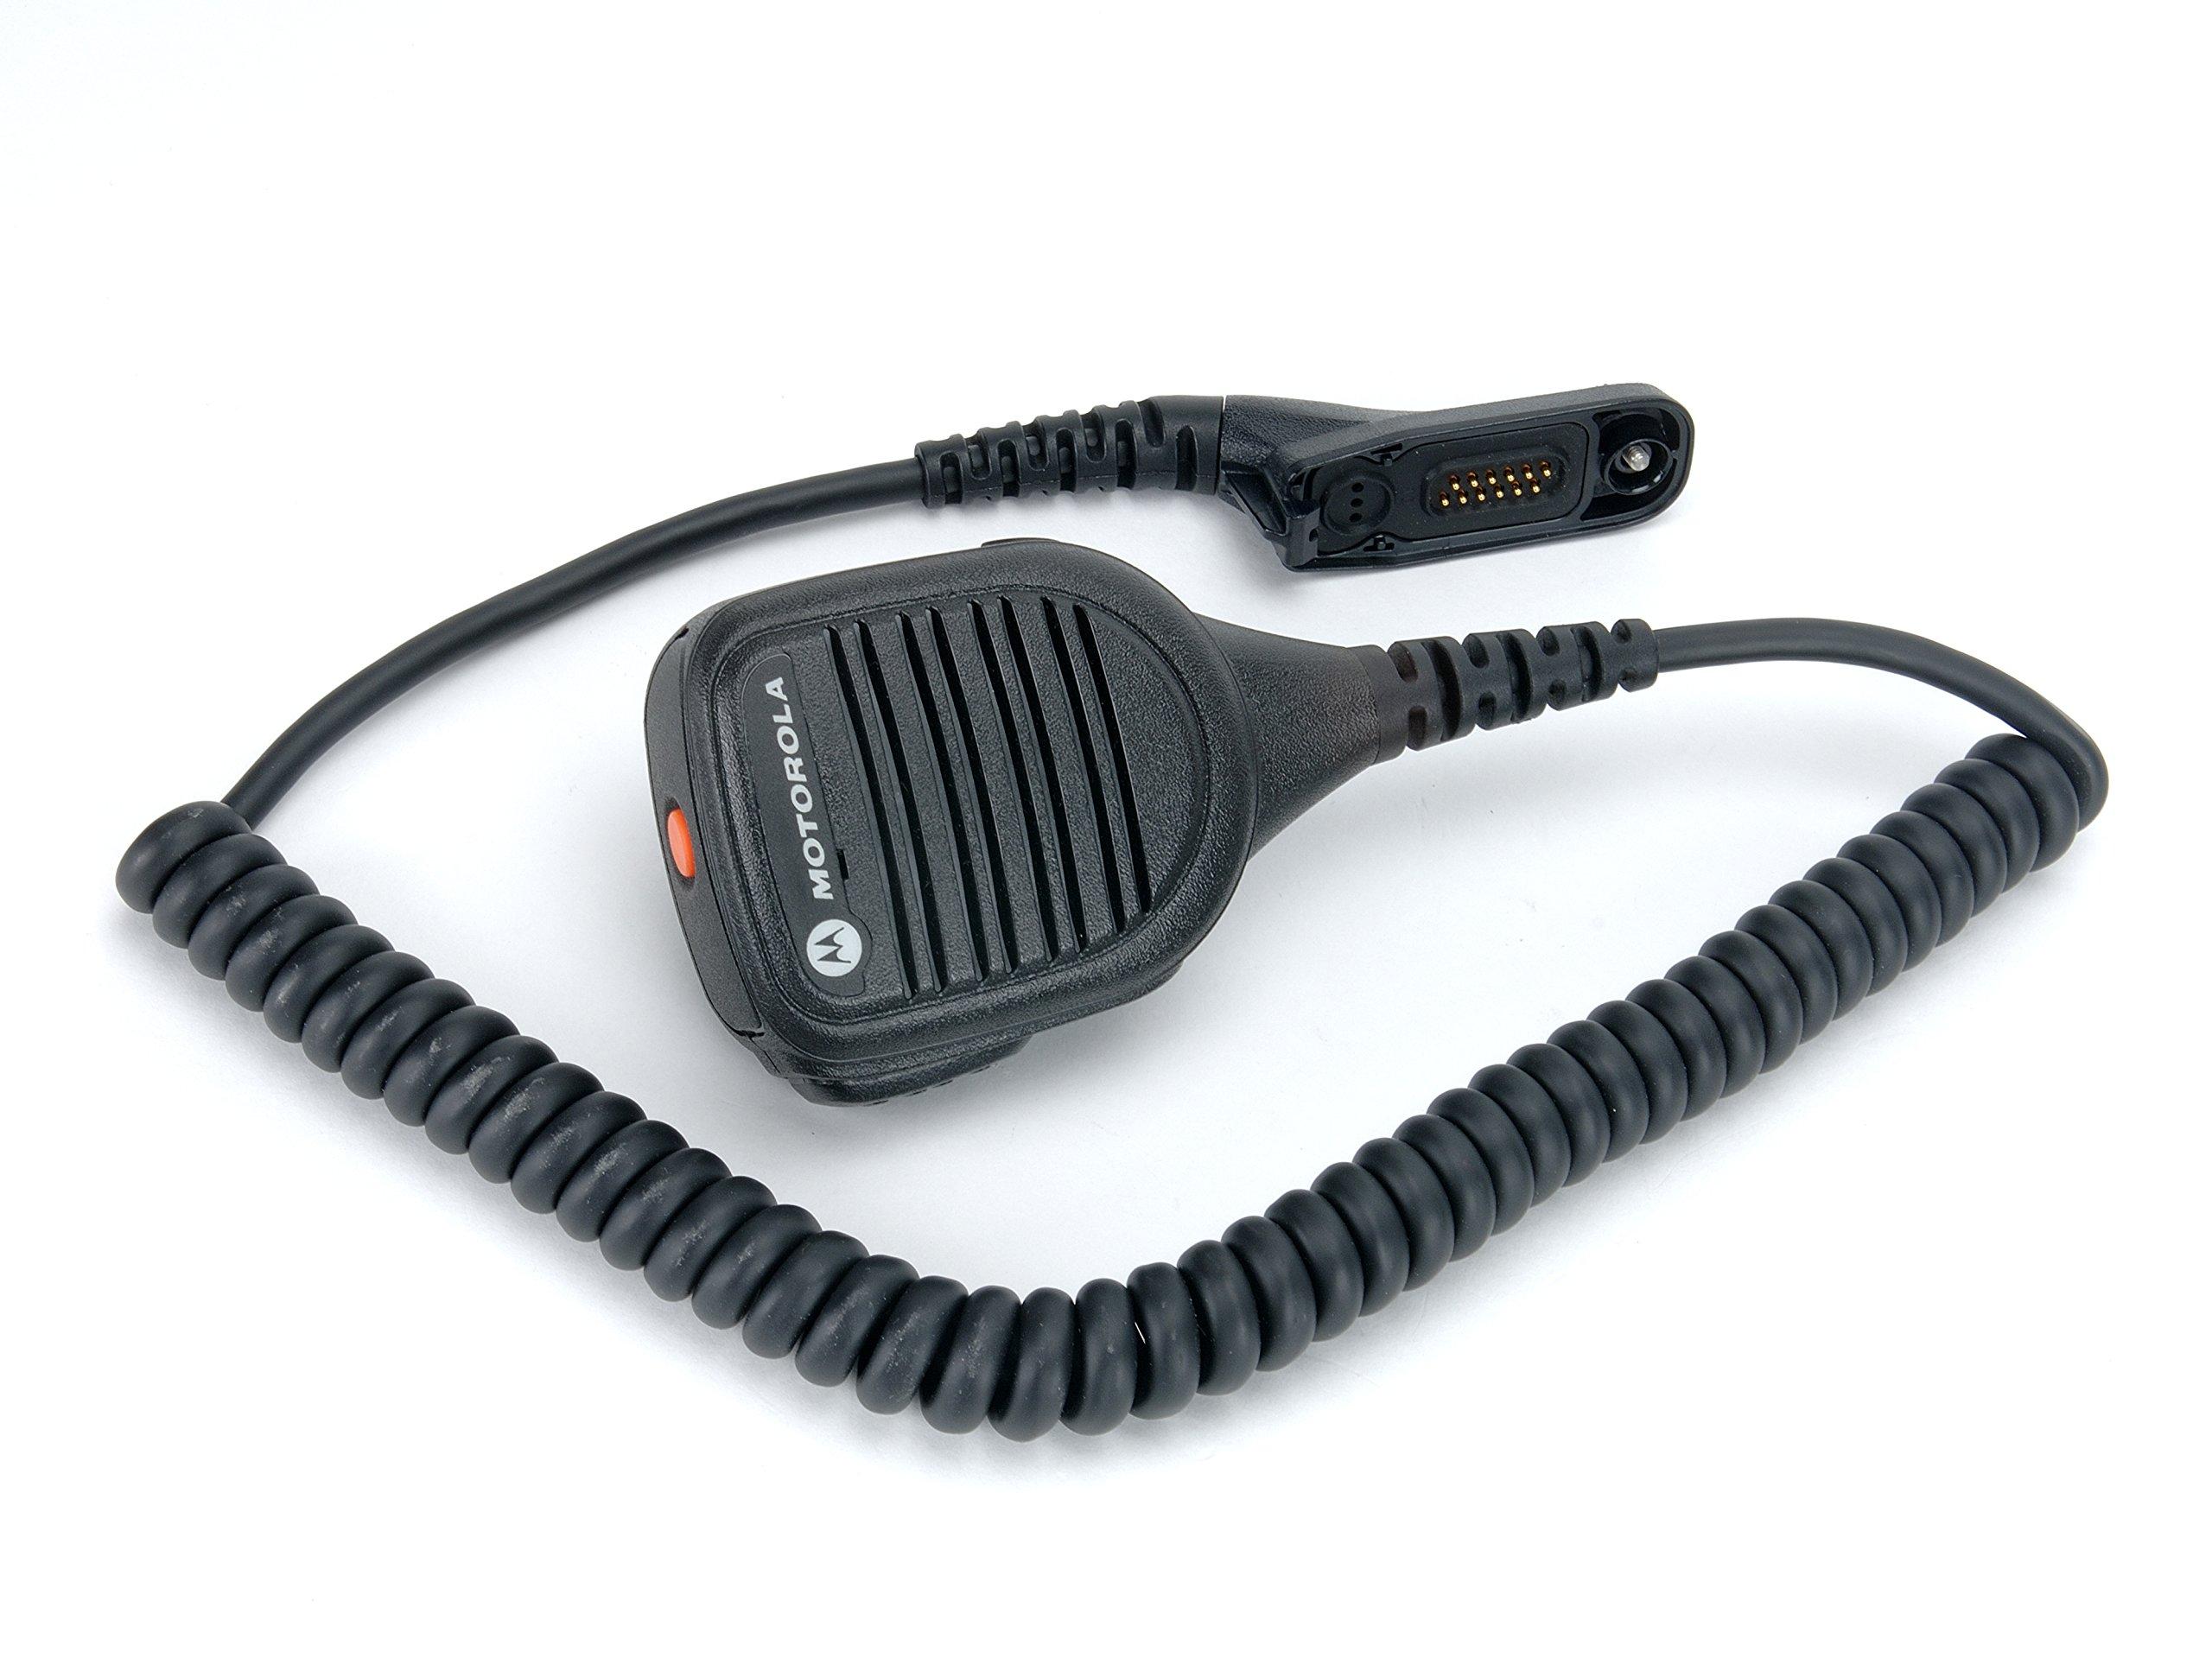 Motorola PMMN4062A Remote Speaker Microphone with Impres Audio (Black)